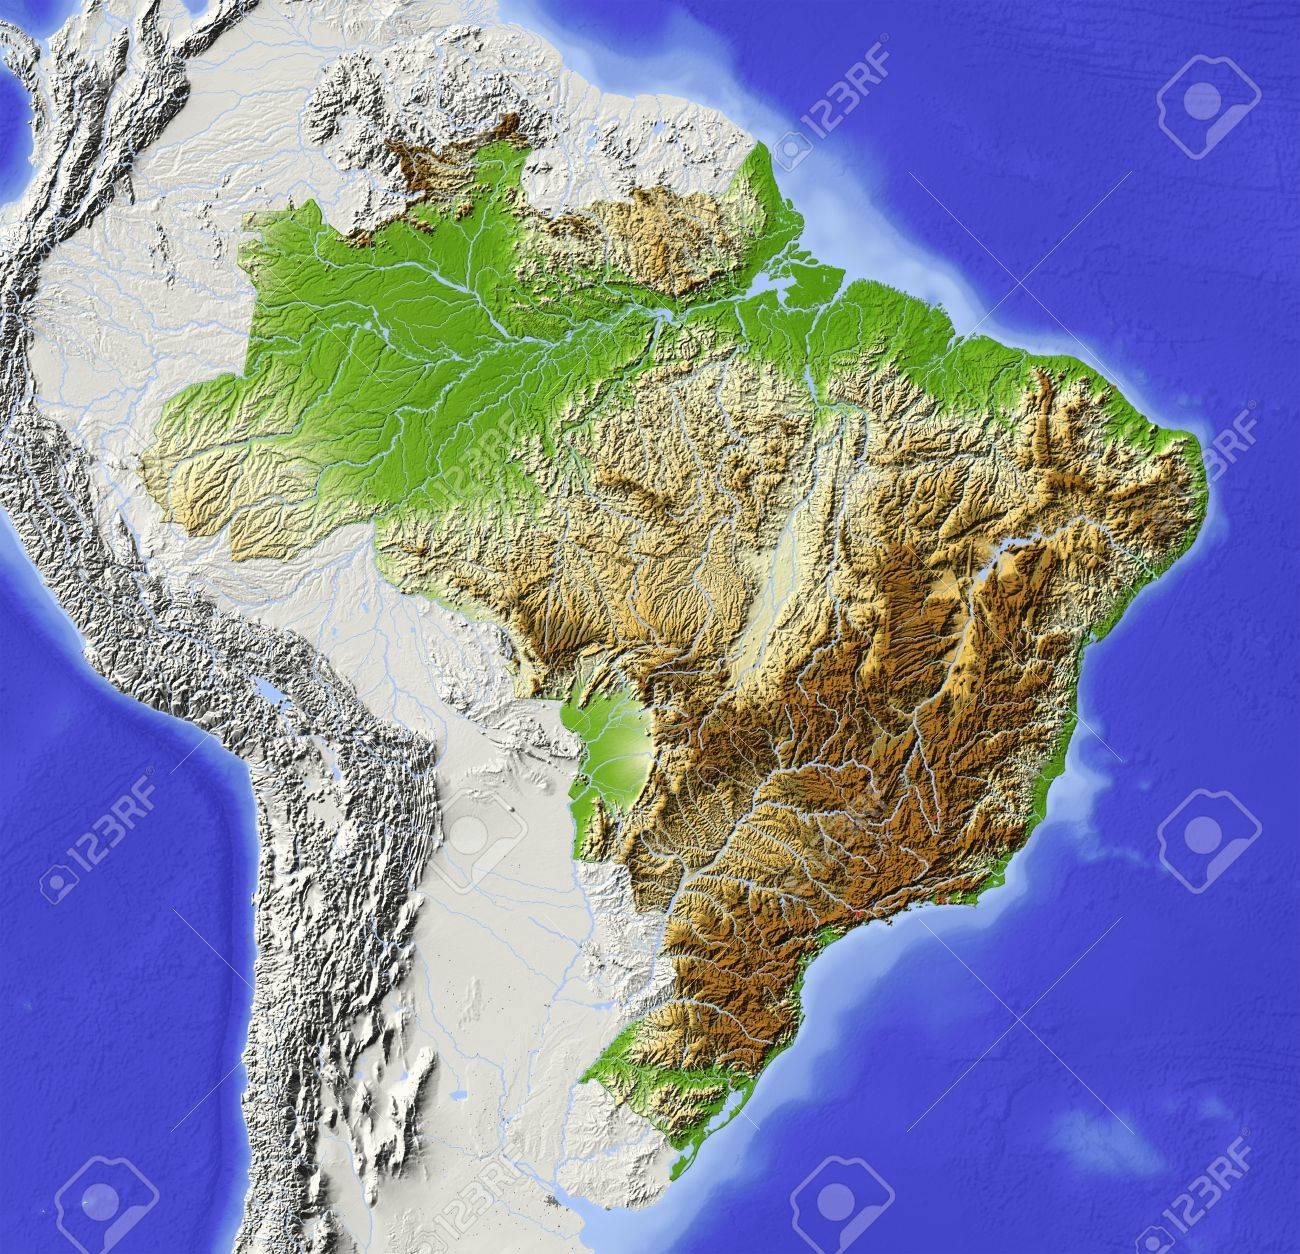 Carte Bresil Relief.Bresil Carte En Relief Ombre Avec Les Grandes Zones Urbaines